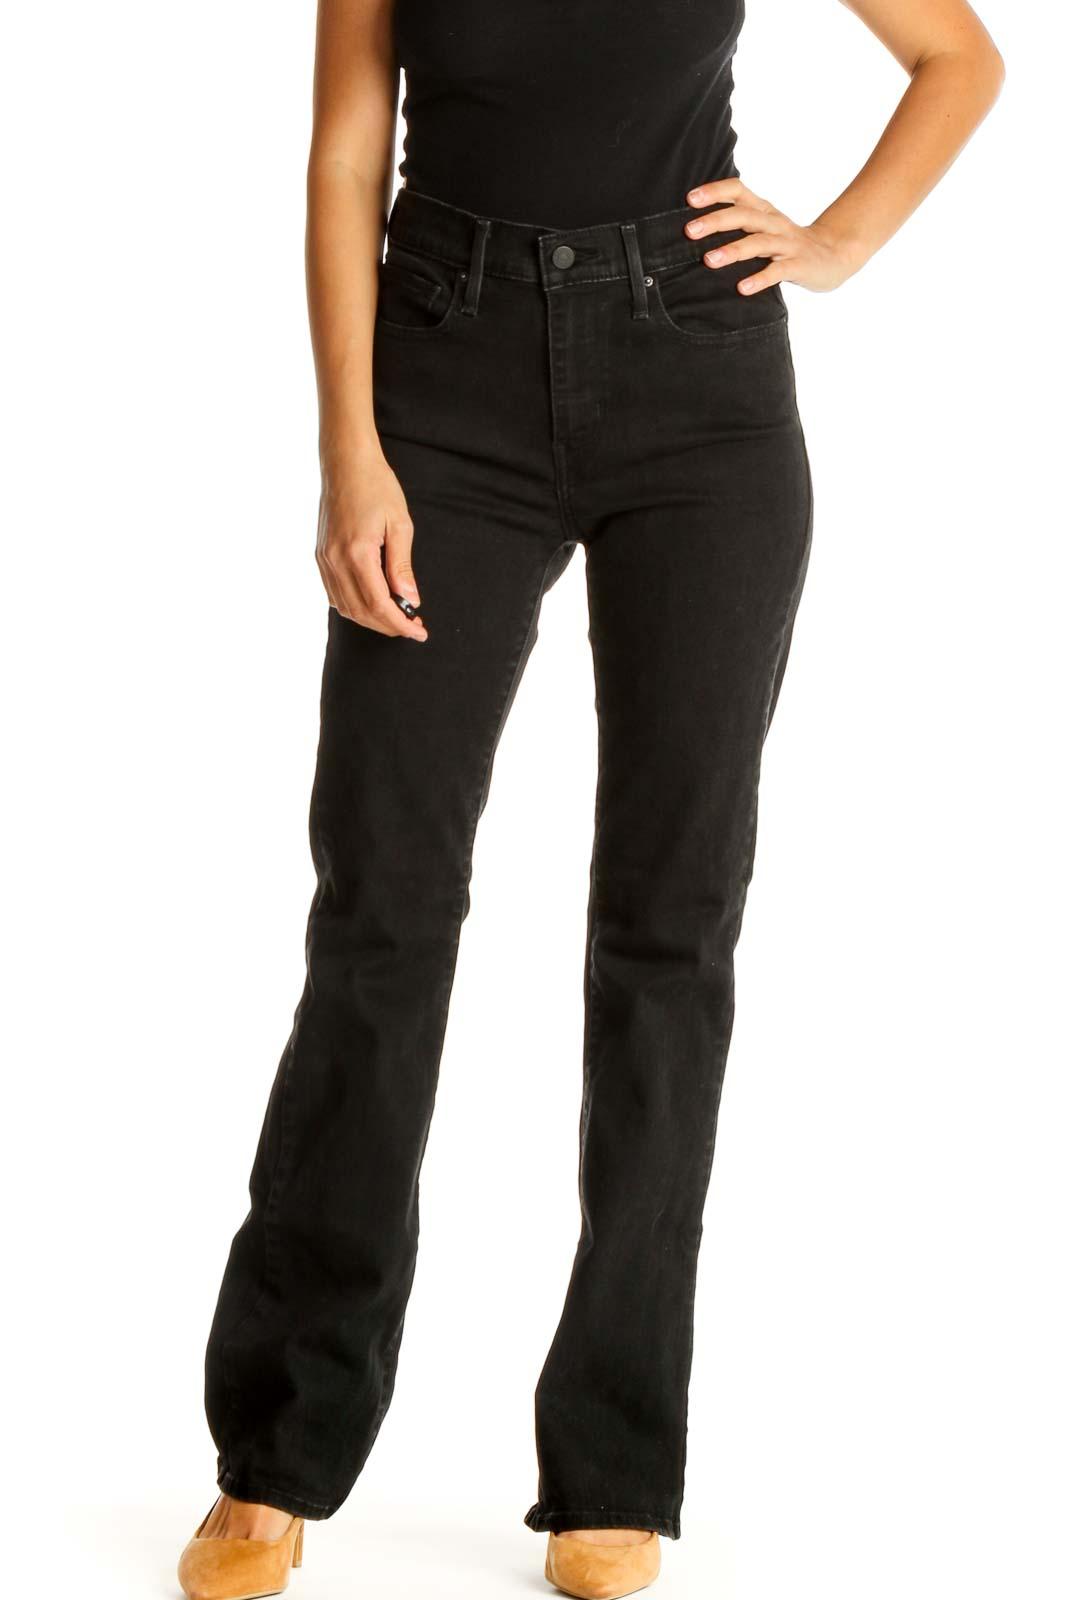 Black Bootcut Jeans Front